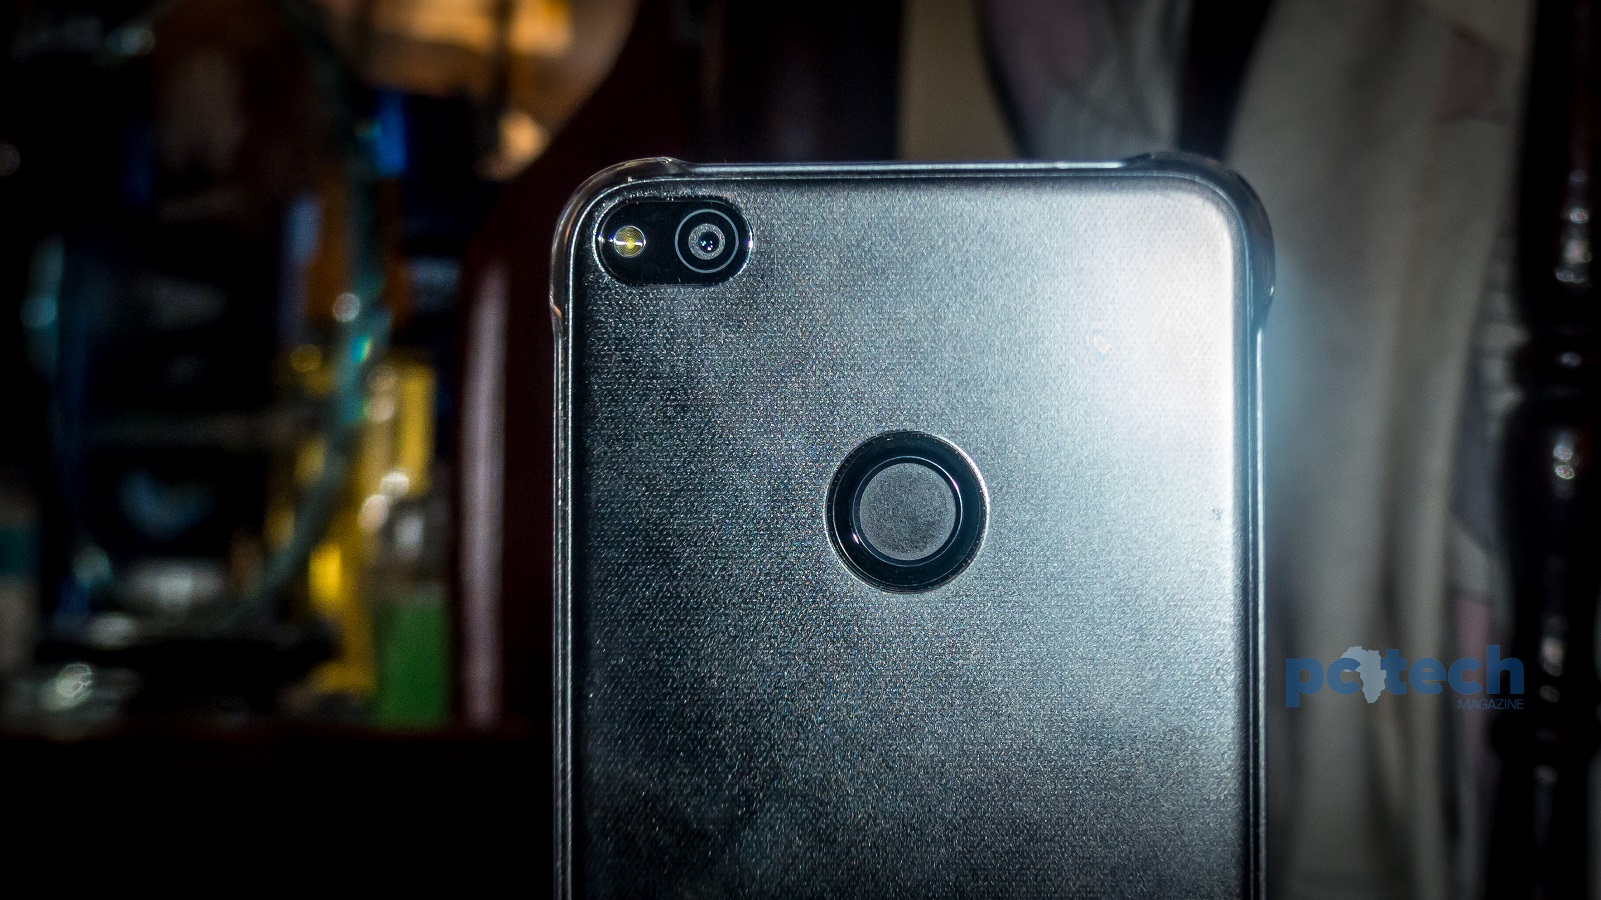 Huawei P8 Lite Review: Stylish, Elegant & Untypical Mid